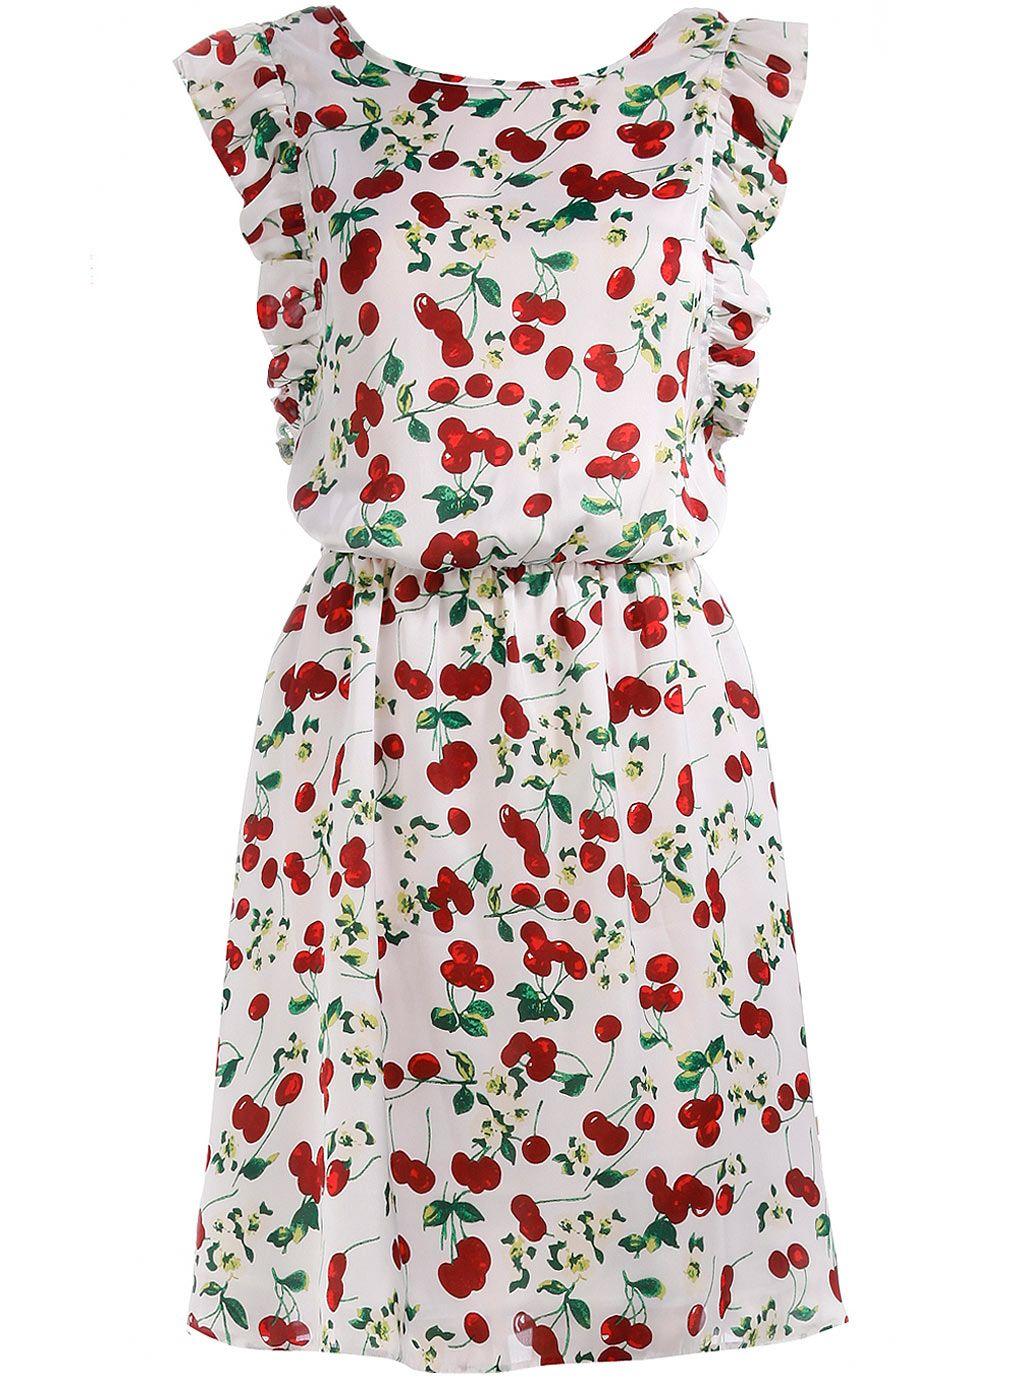 Pin By Maureen Elizabeth On Cherries Cherry Print Dress Cherry Dress Frill Dress [ 1384 x 1019 Pixel ]